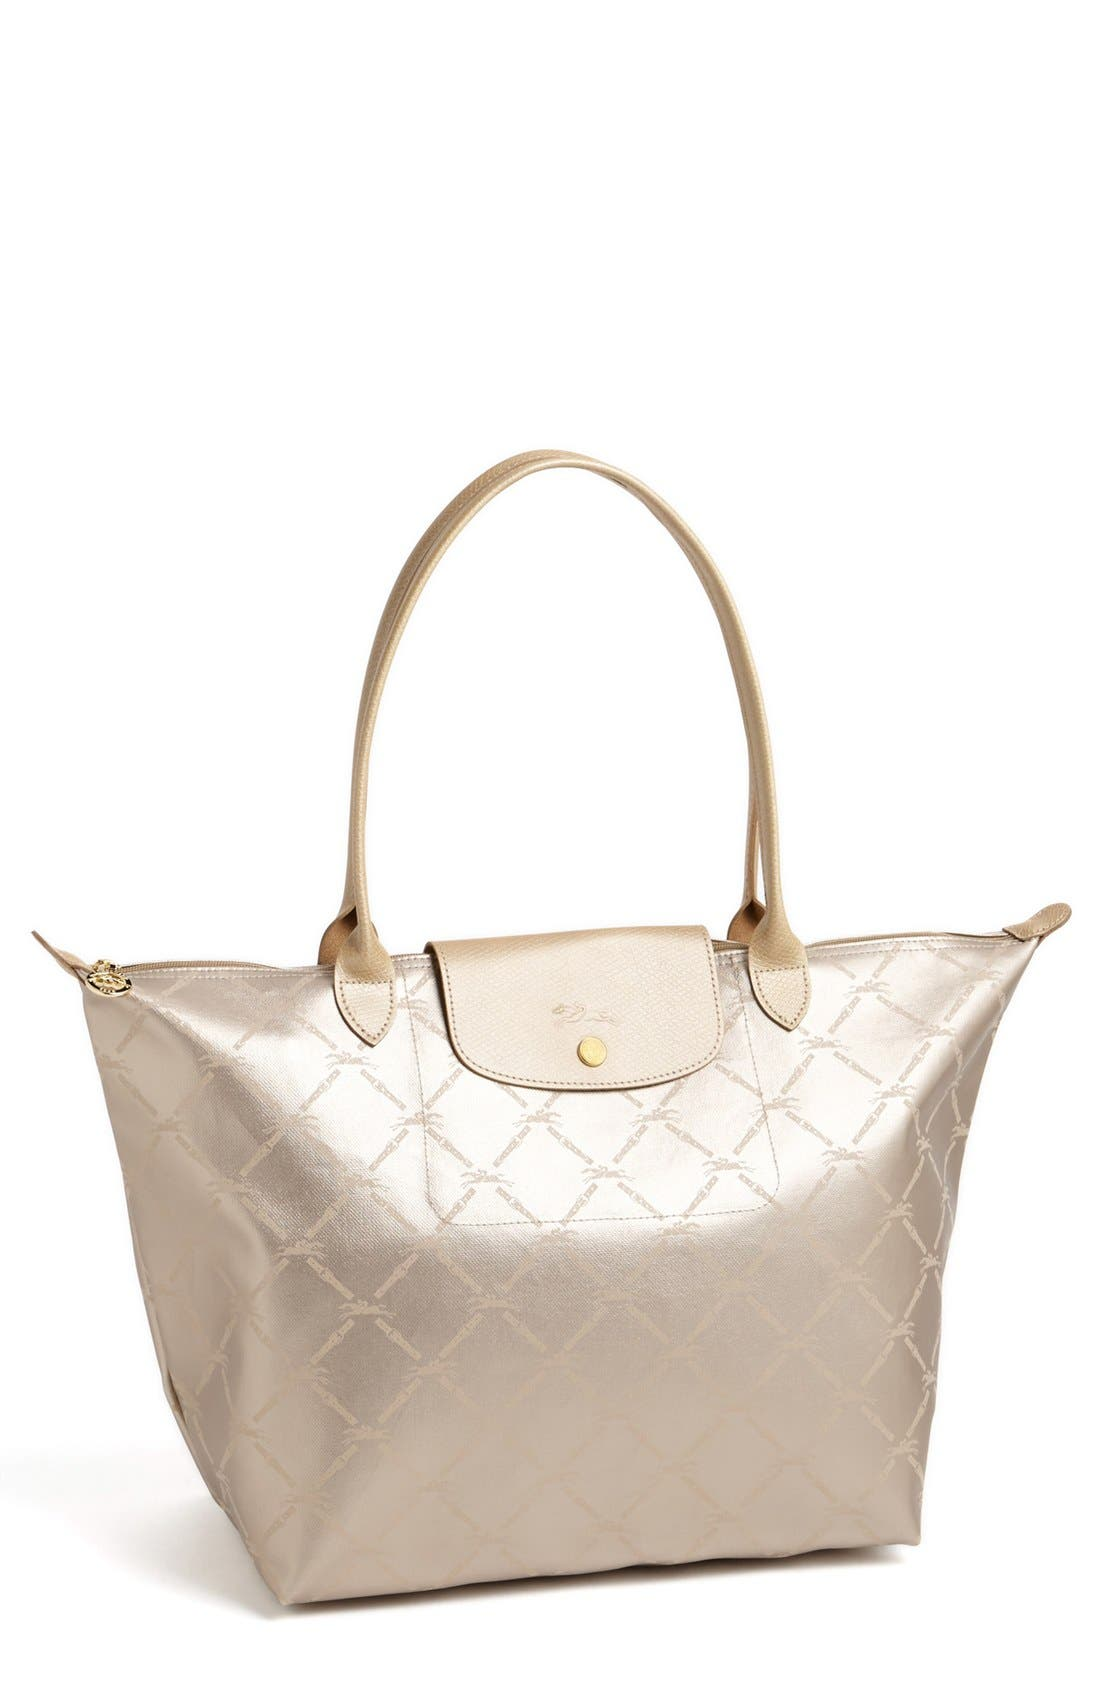 Main Image - Longchamp Shoulder Tote